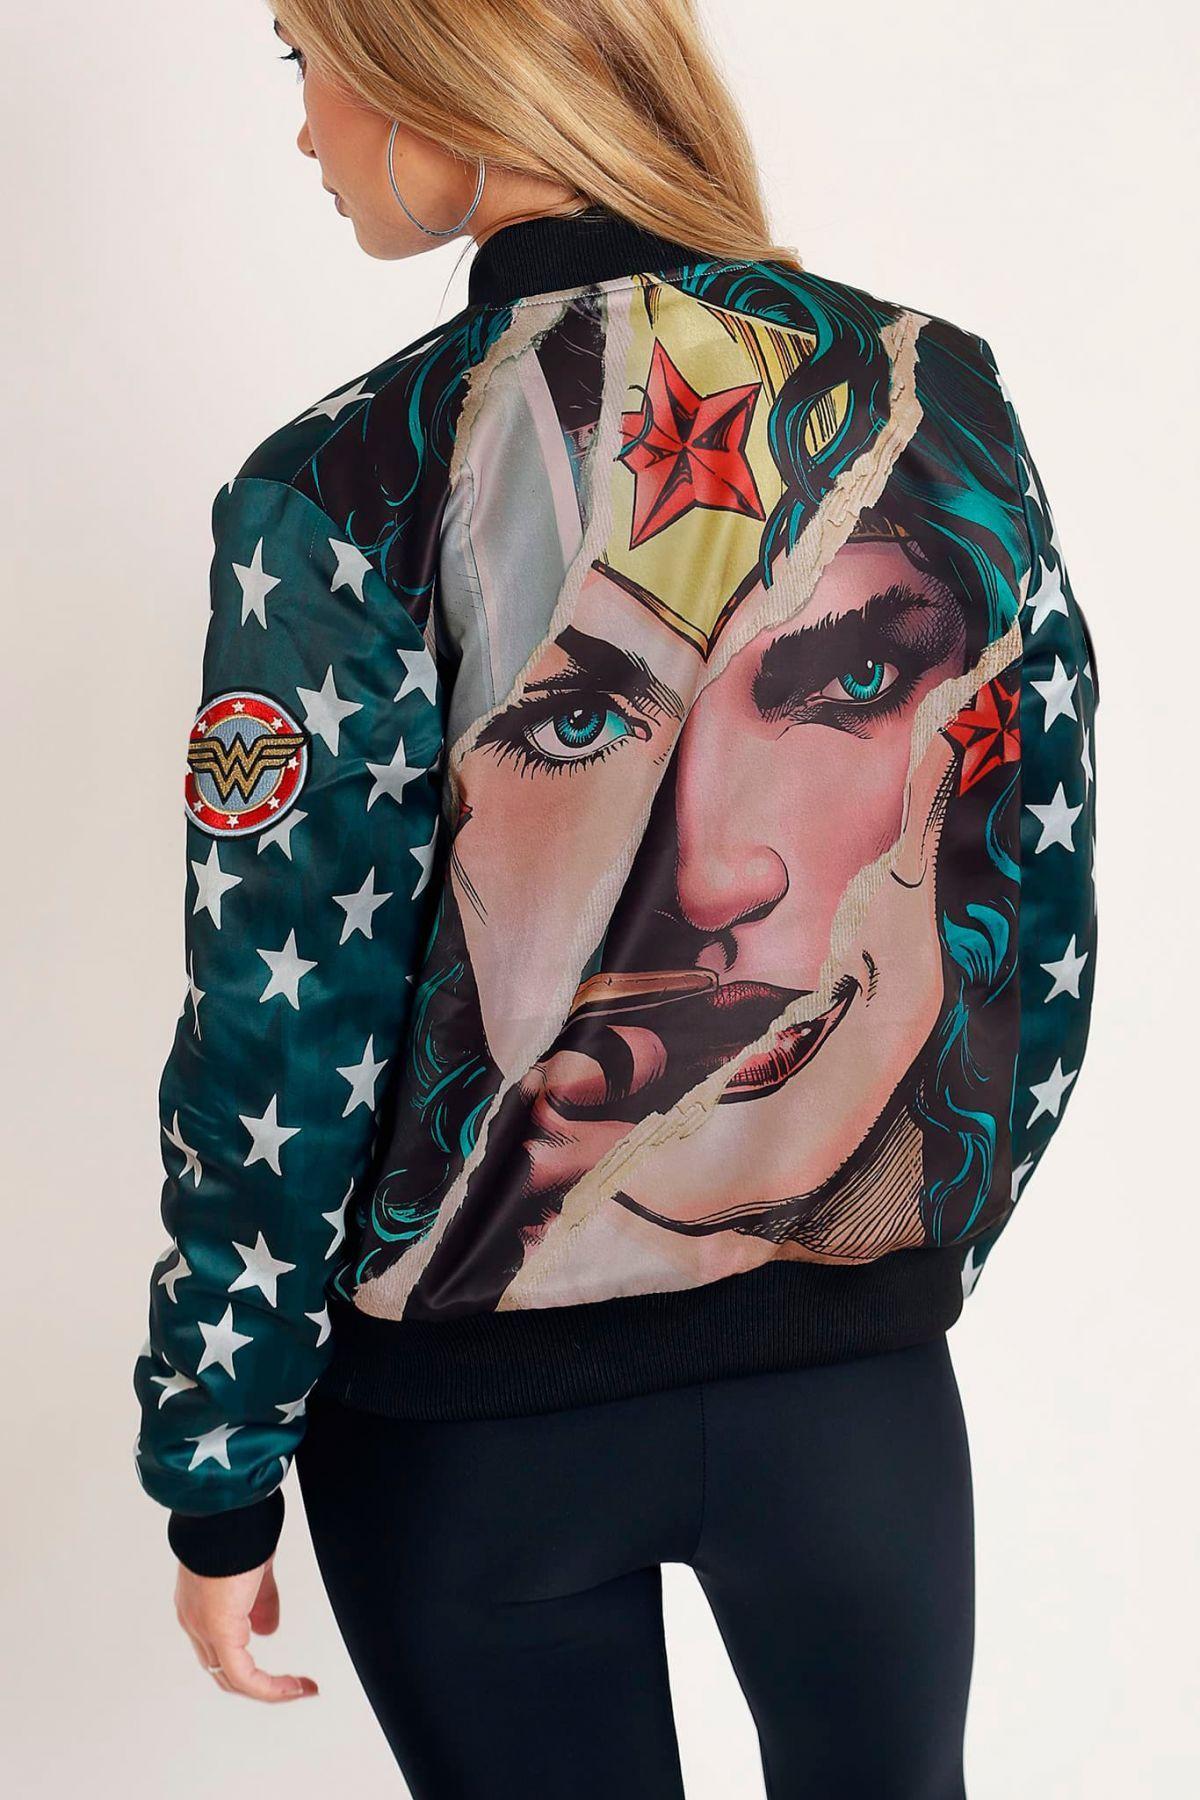 Vintage Wonder Woman Bomber Jacket Limited in 2020